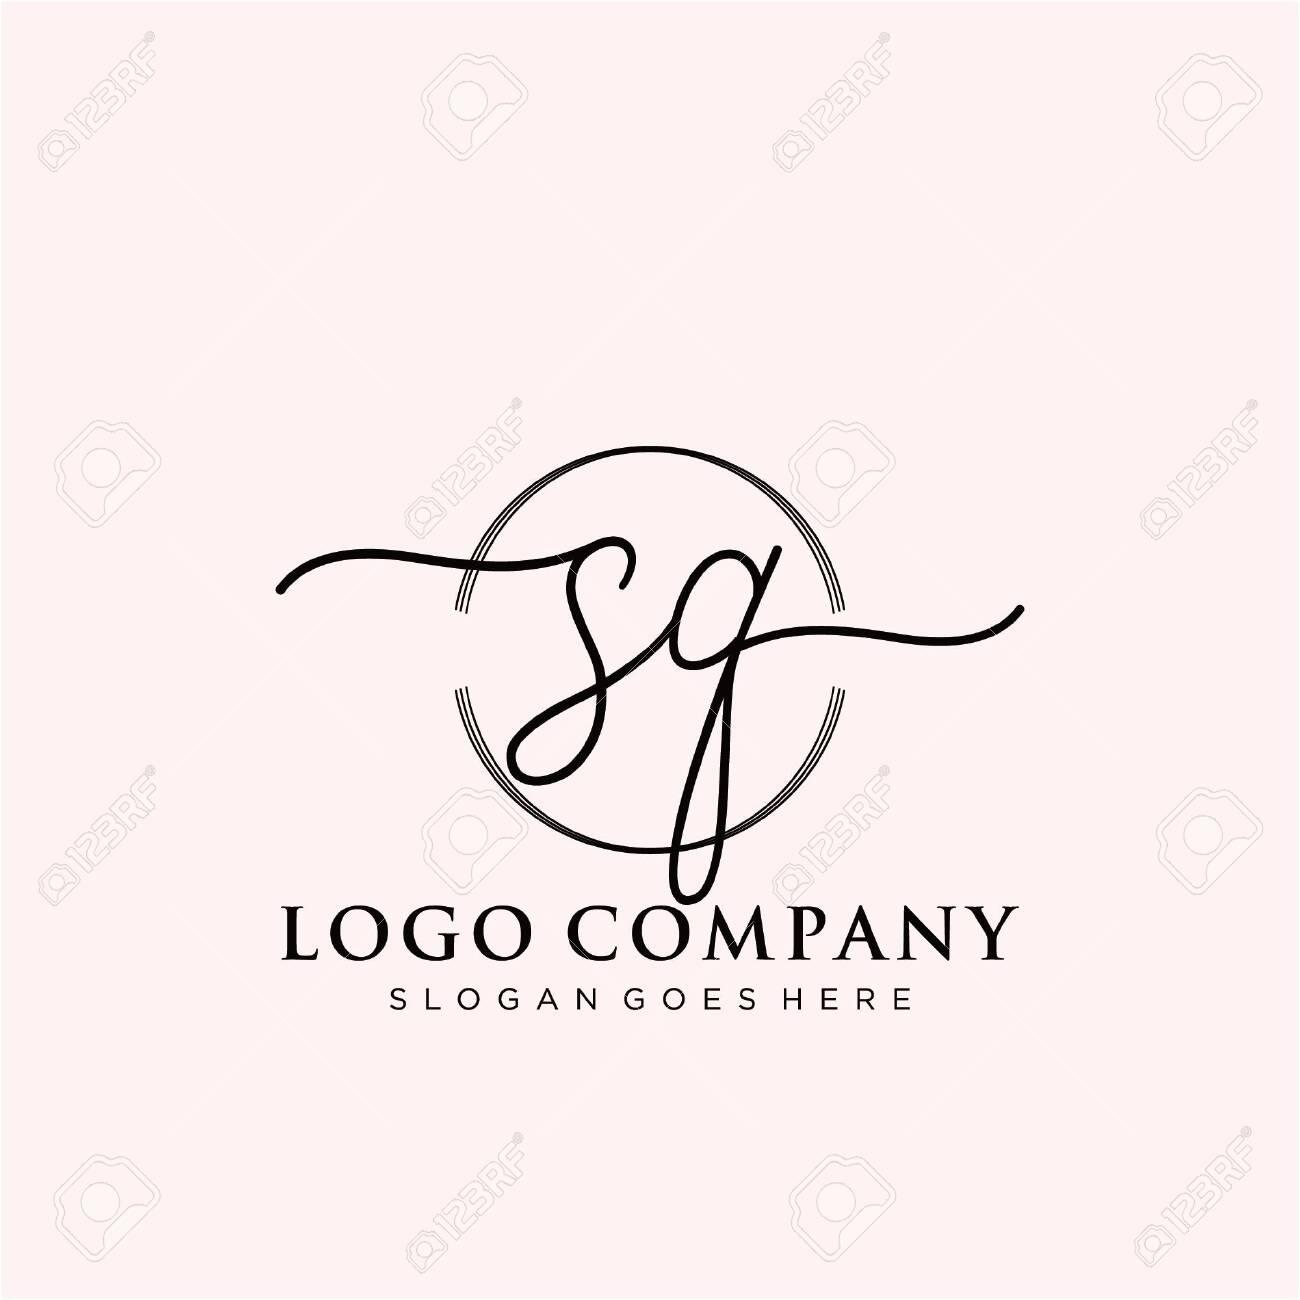 Initial handwriting logo design Beautiful design handwritten logo for fashion, team, wedding, luxury logo. - 147622015